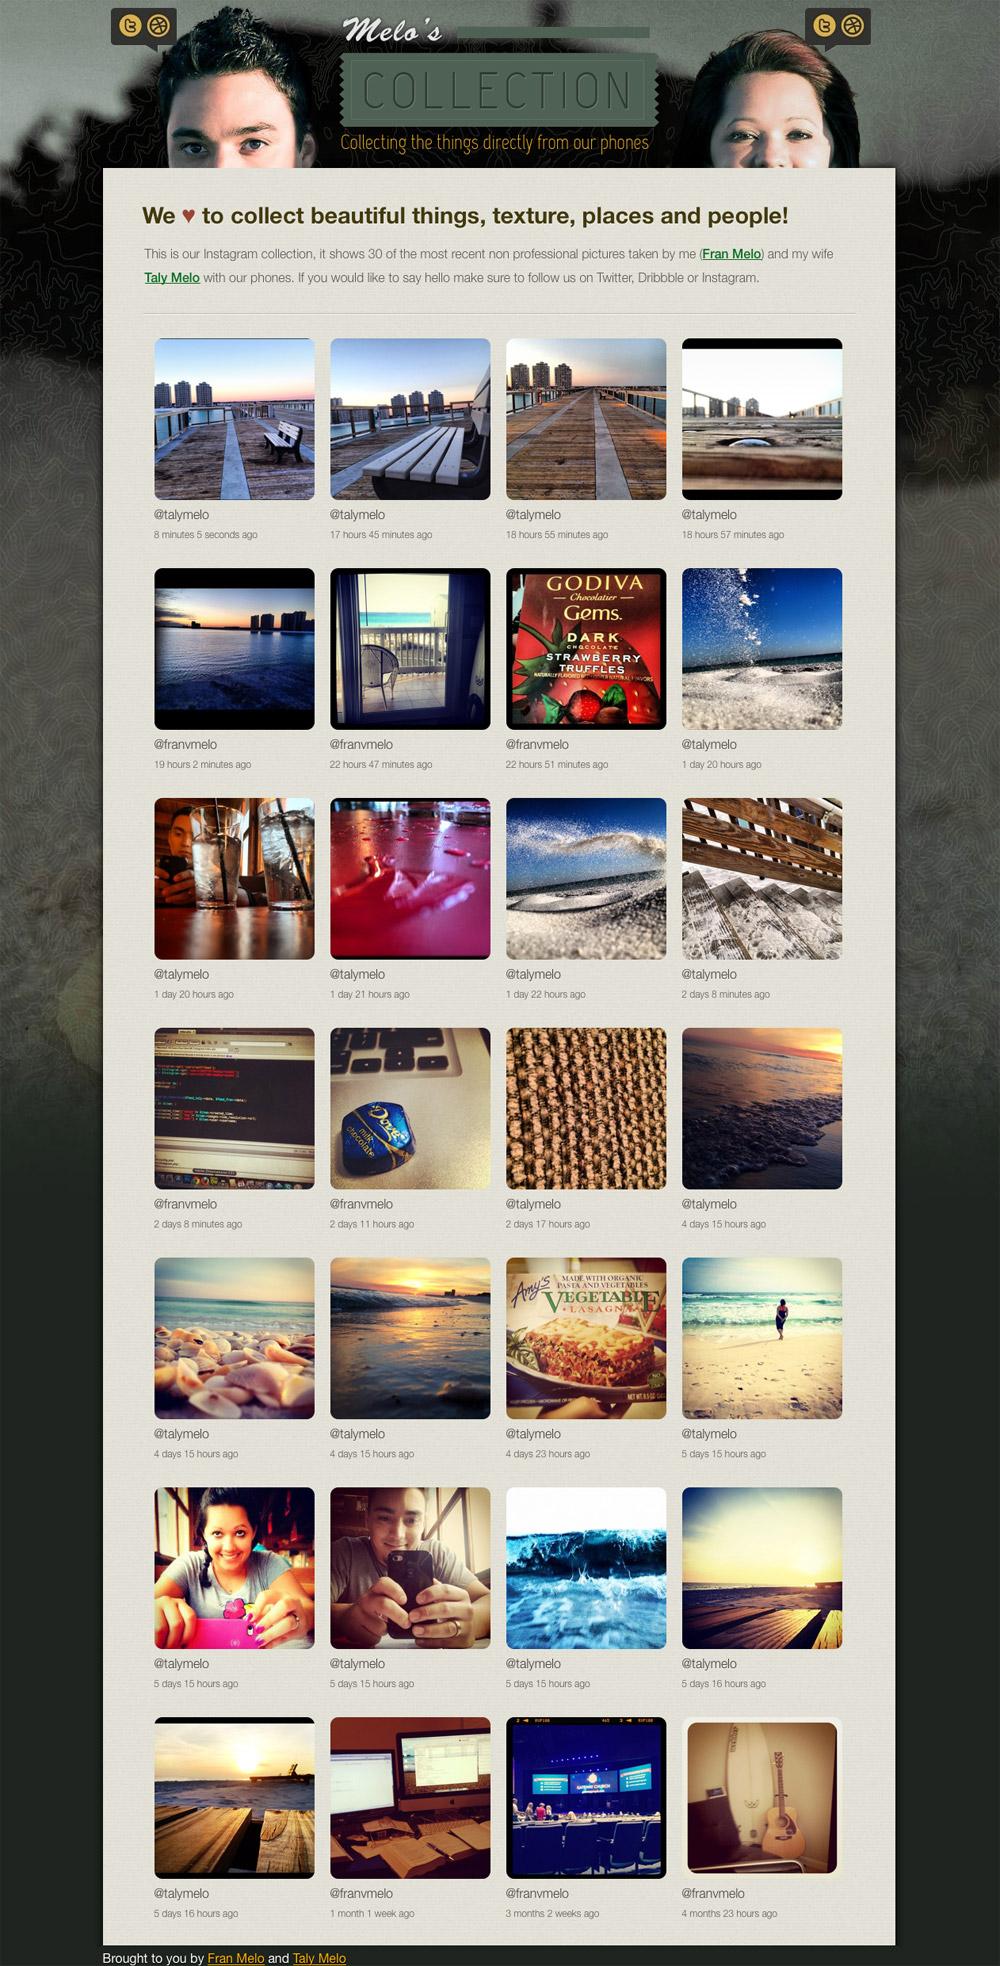 Melo Collection Website Screenshot